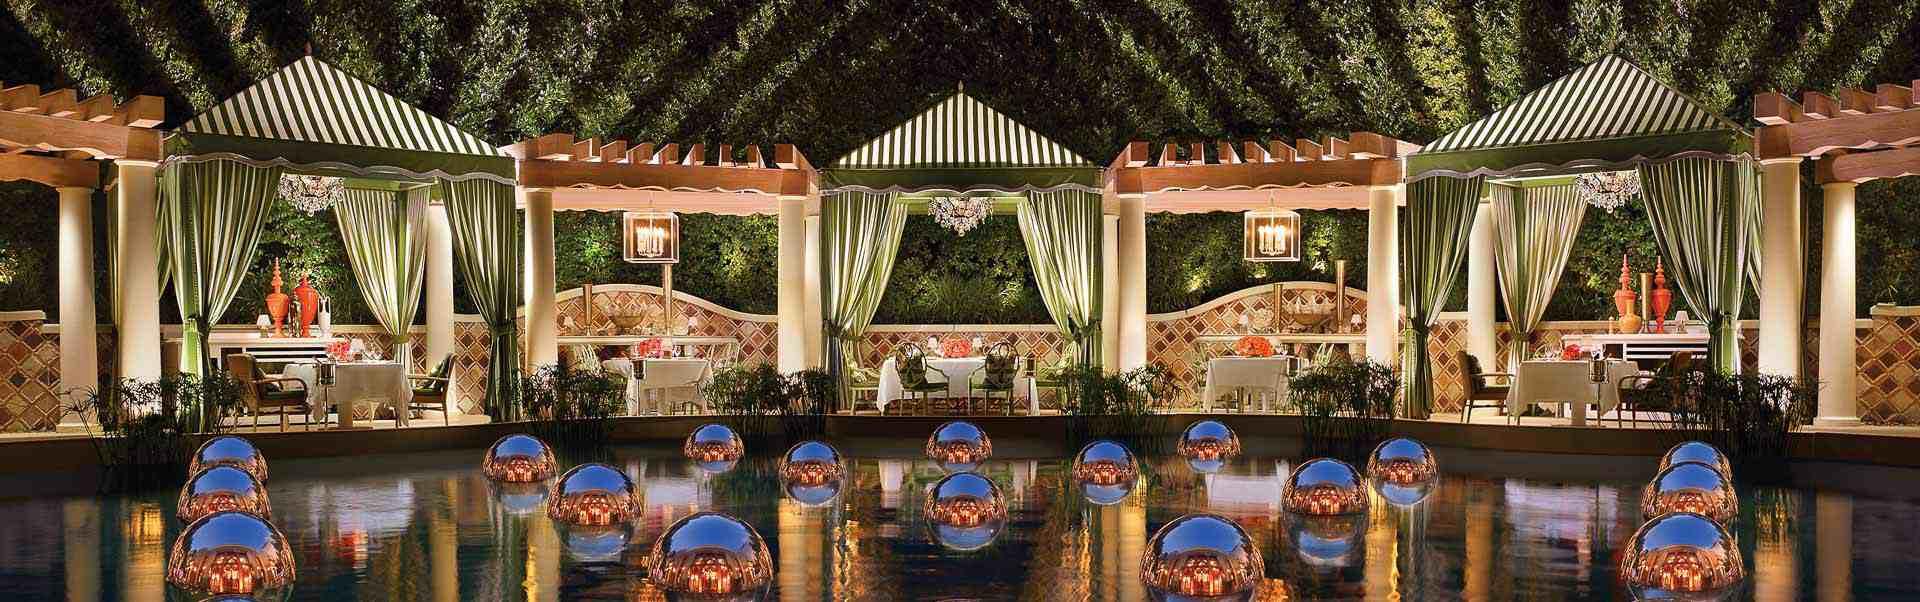 Costa Di Mare at Wynn Las Vegas